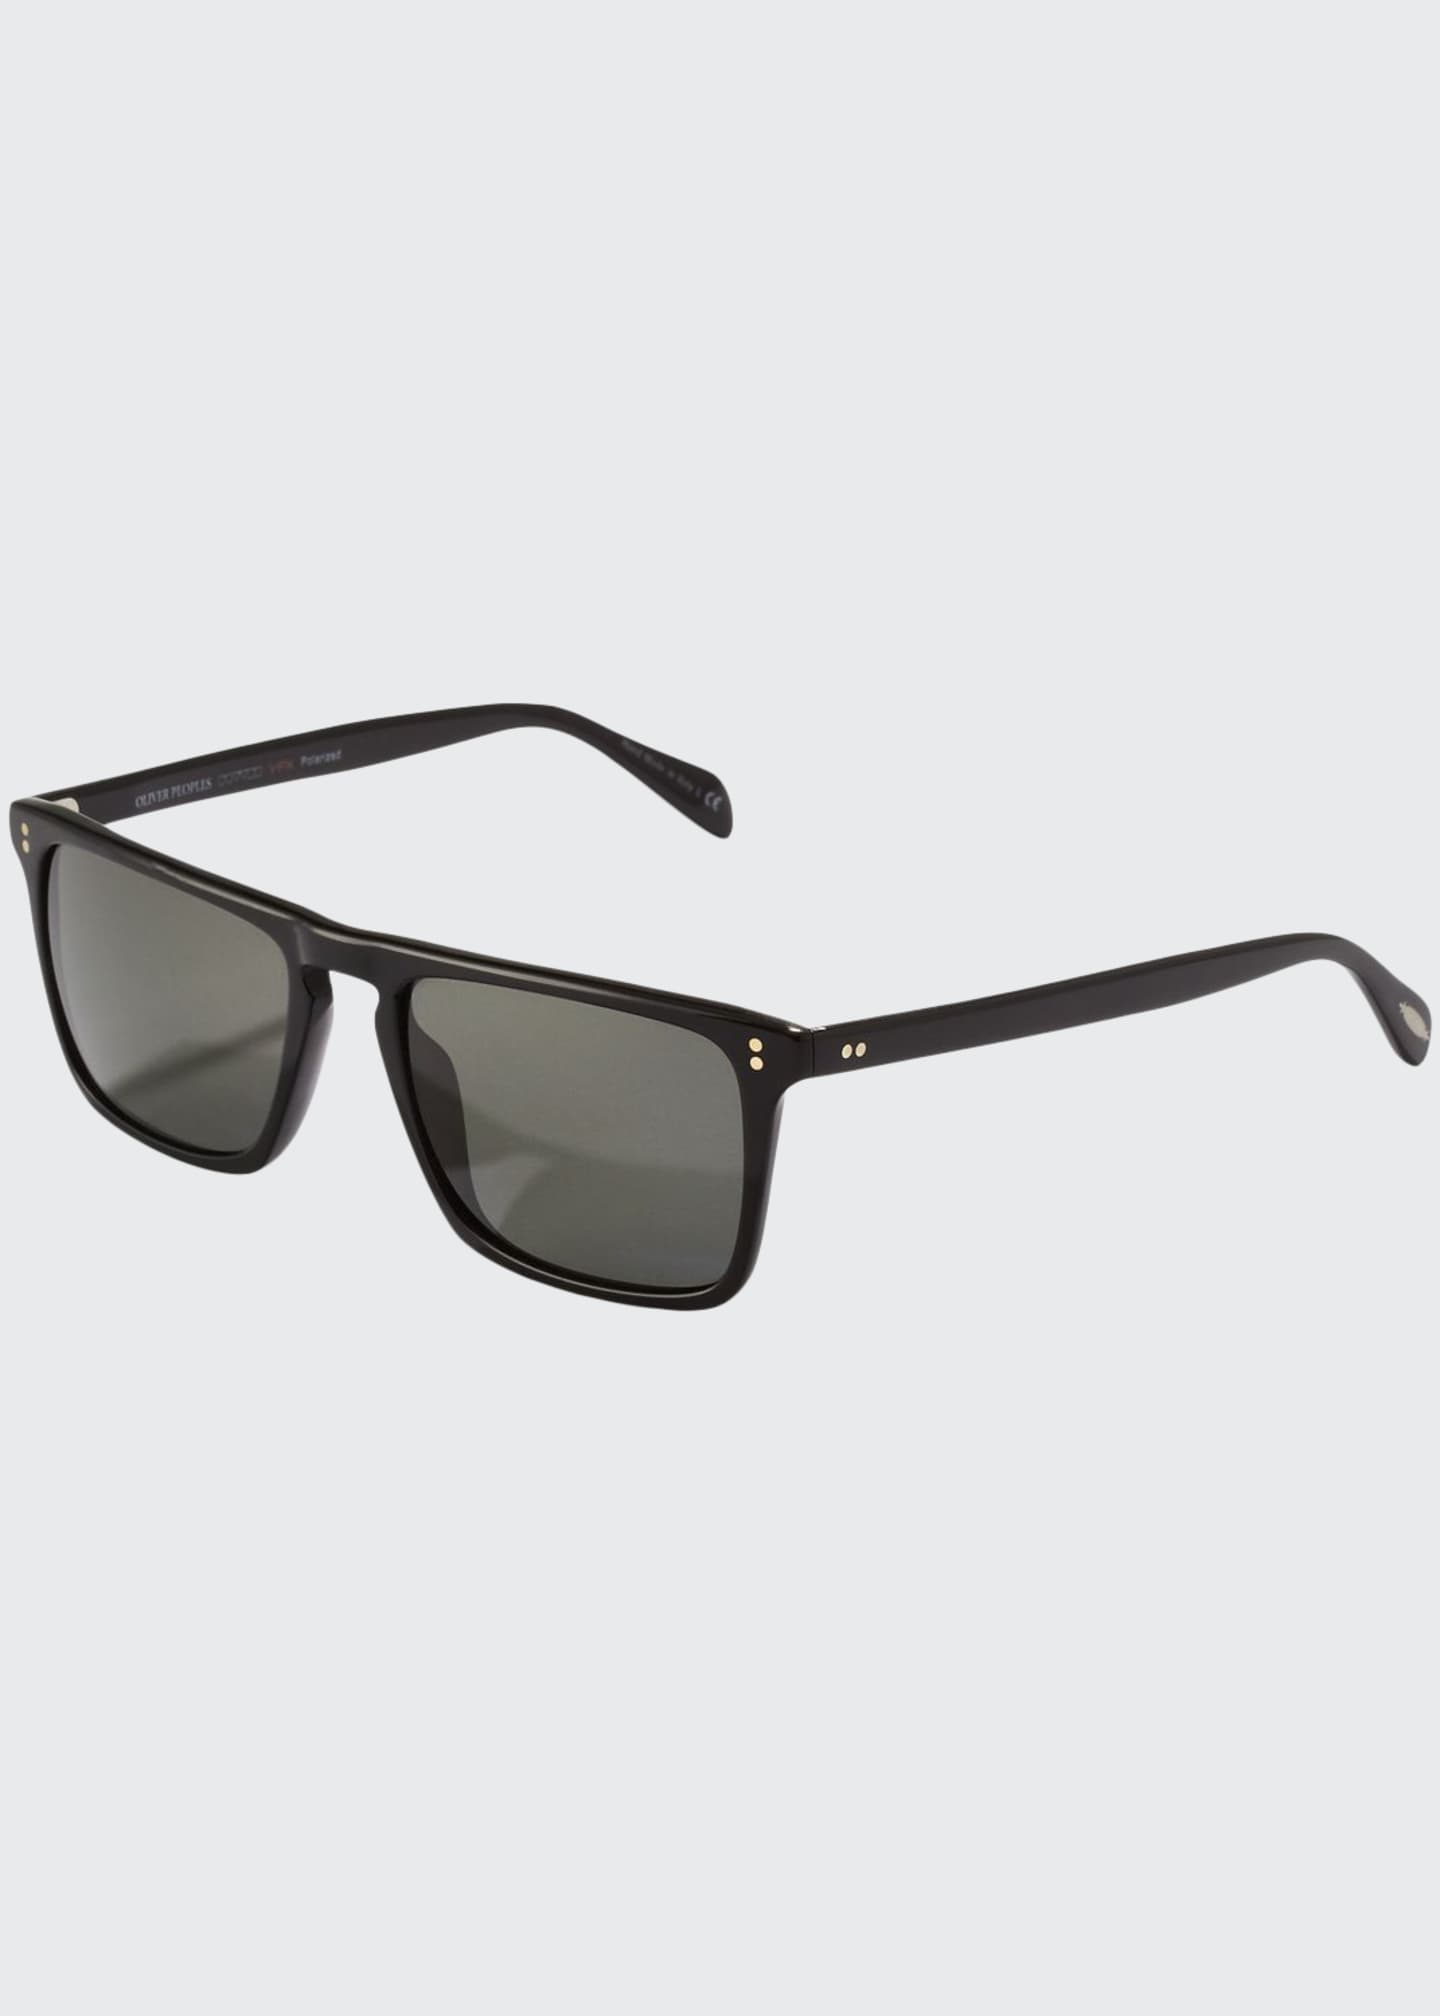 Oliver Peoples Bernardo Polarized Sunglasses, Black